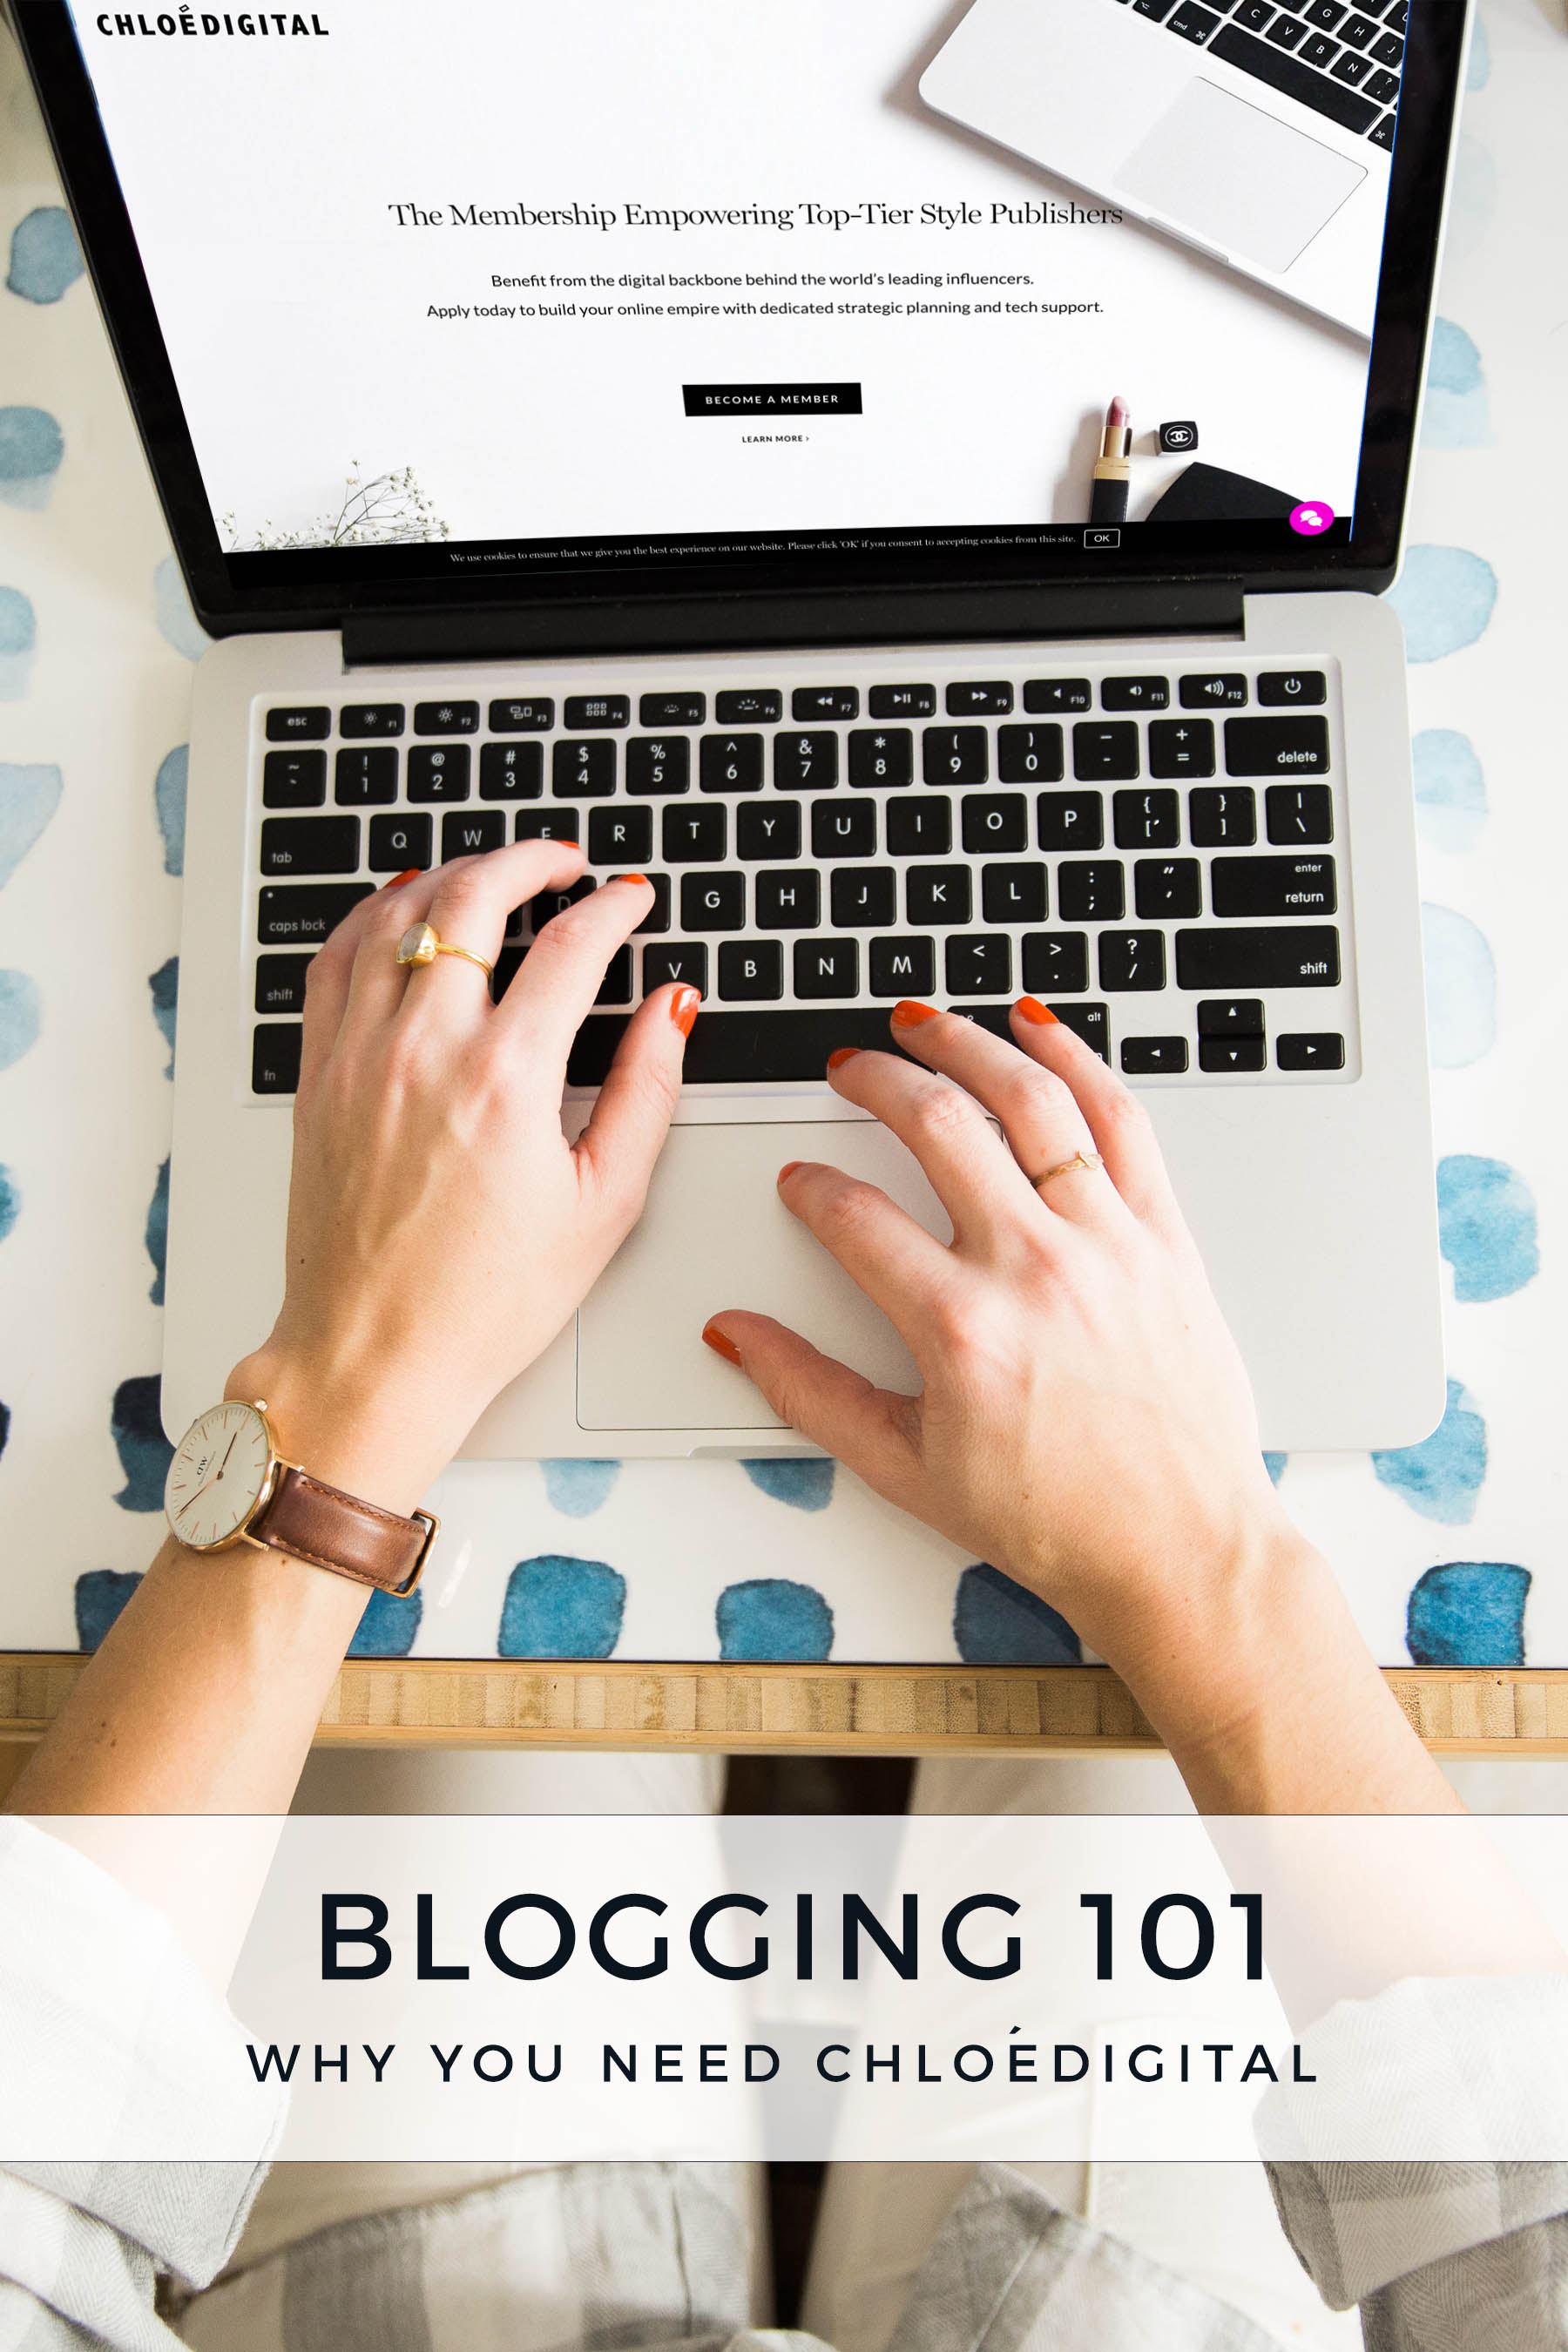 blogging101-chloedigital